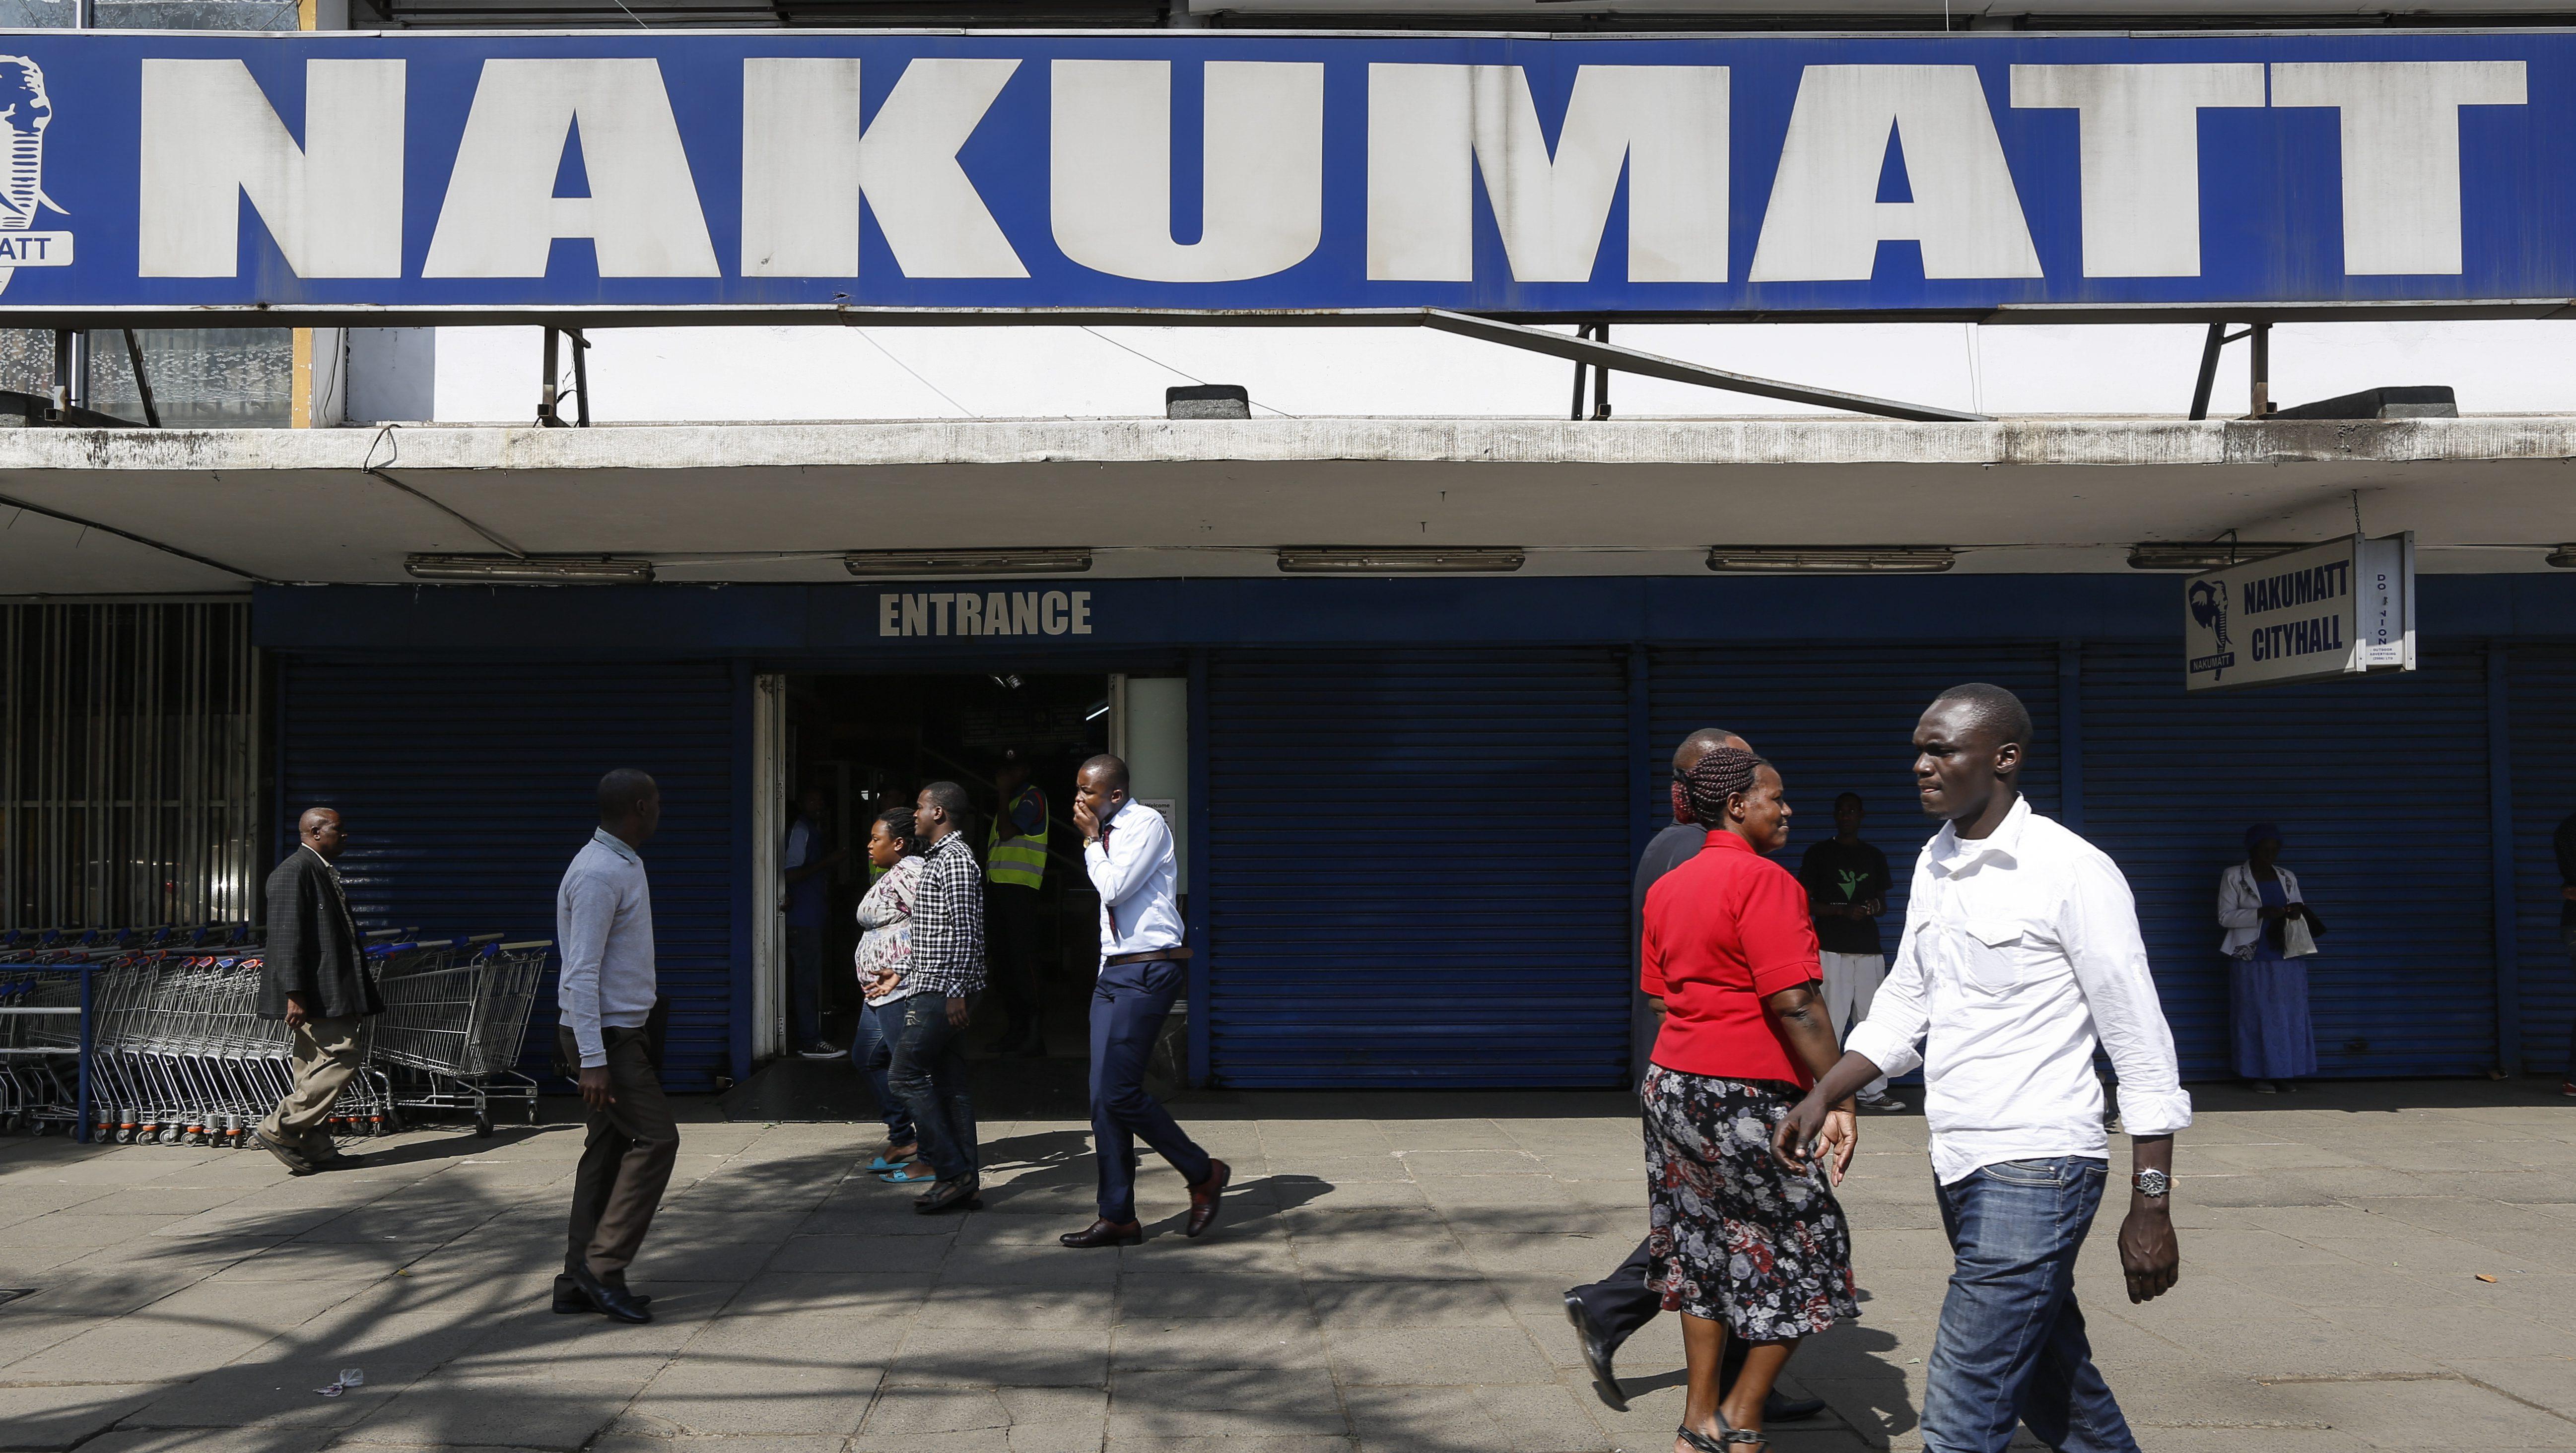 Kenya's Nakumatt files for bankruptcy as Shoprite prepares